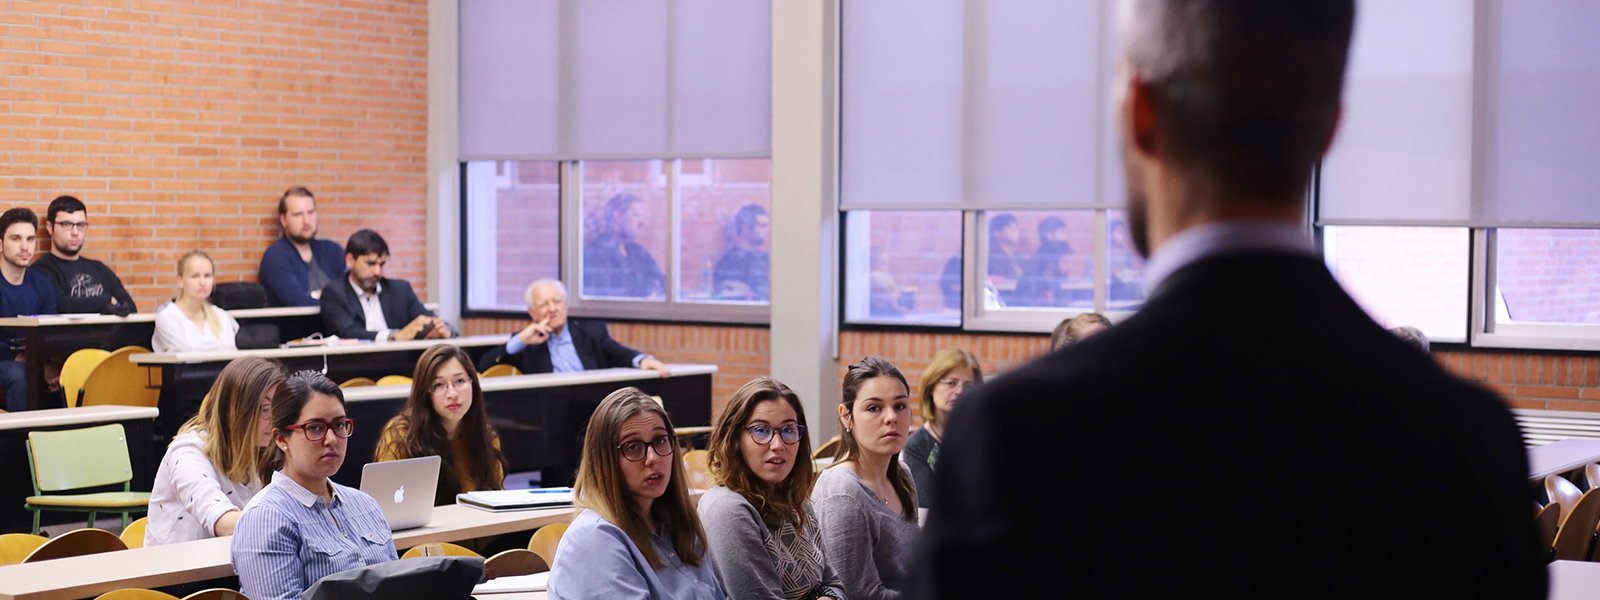 UniversidadesCabecera